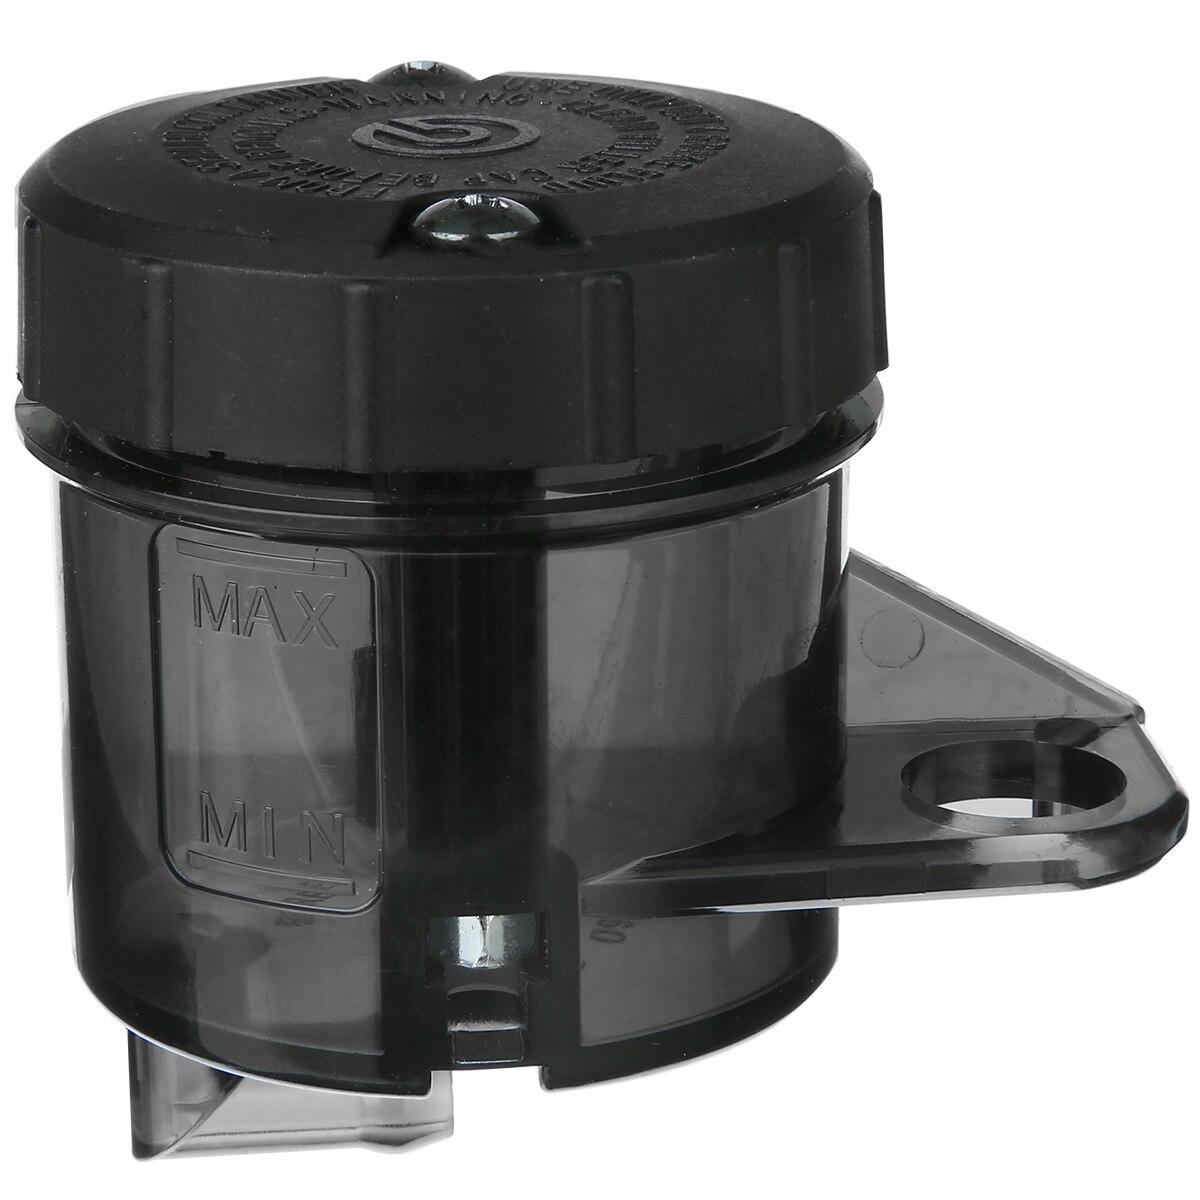 1pc Motorcycle Front Rear Brake Fluid Tank Reservoir Oil Cup Transparent Smoke Black For Kawasaki Honda Yamaha KTM Vespa